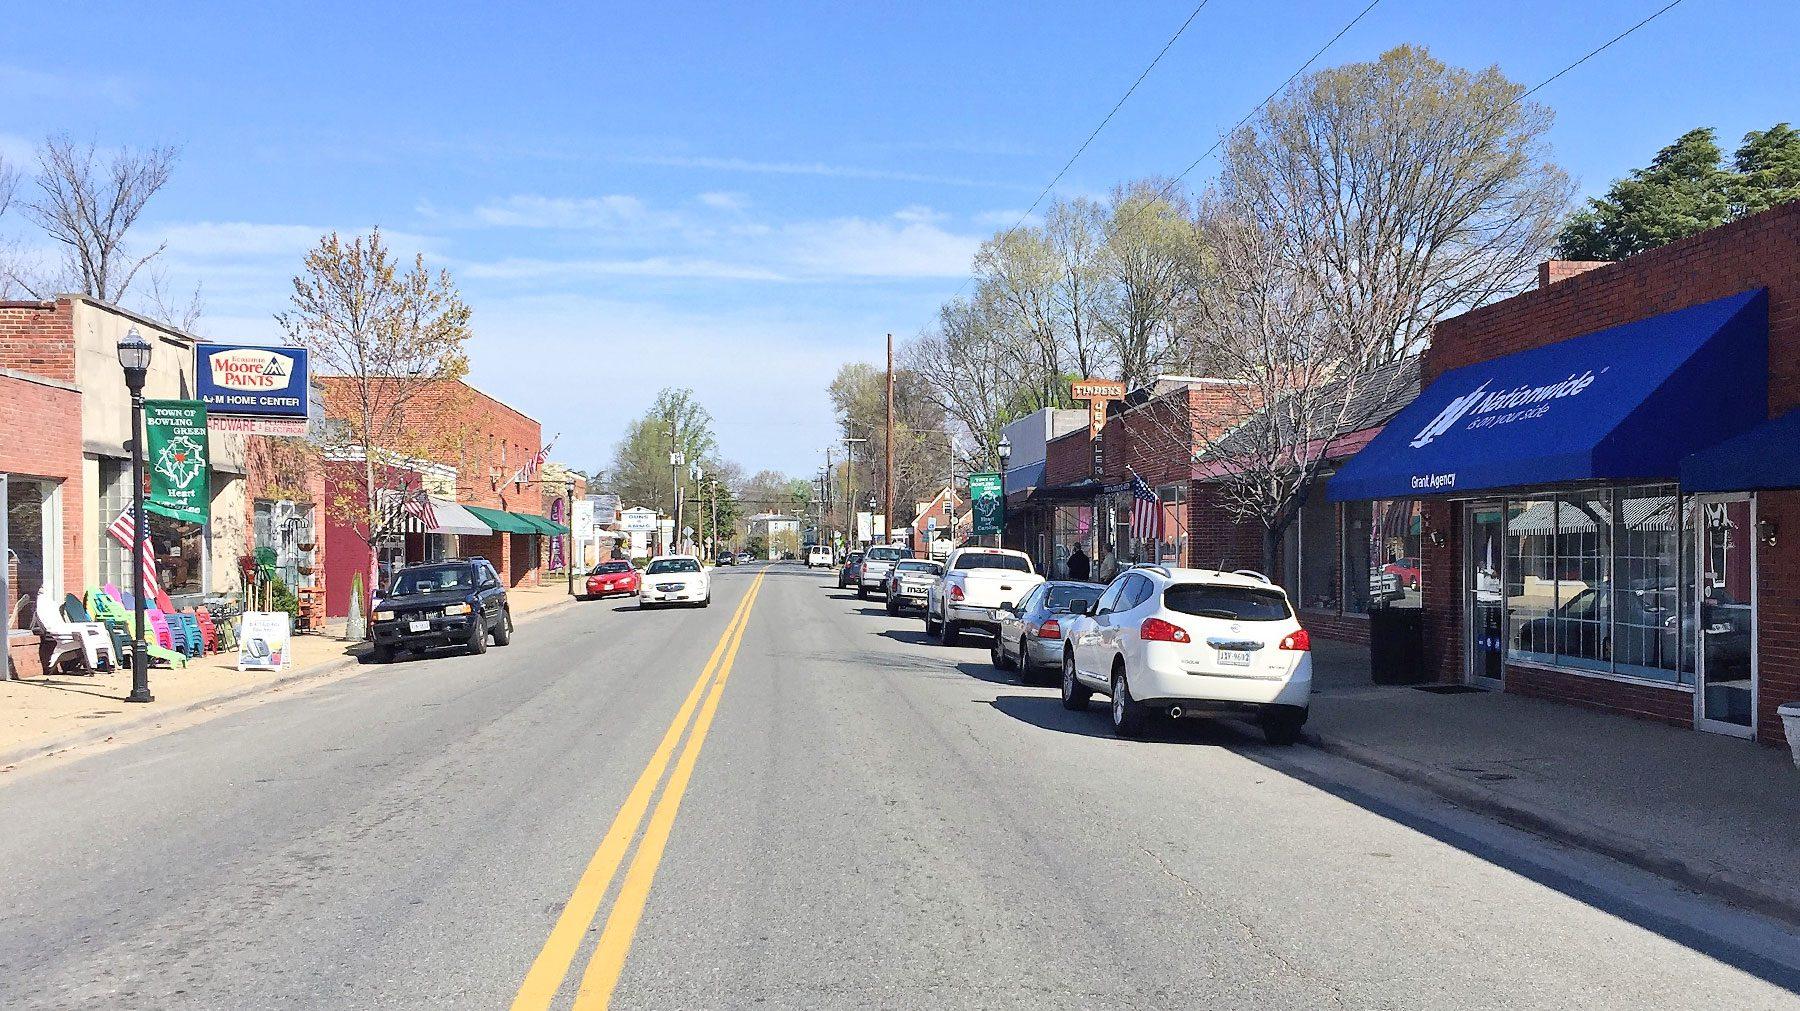 Caroline County, Virginia